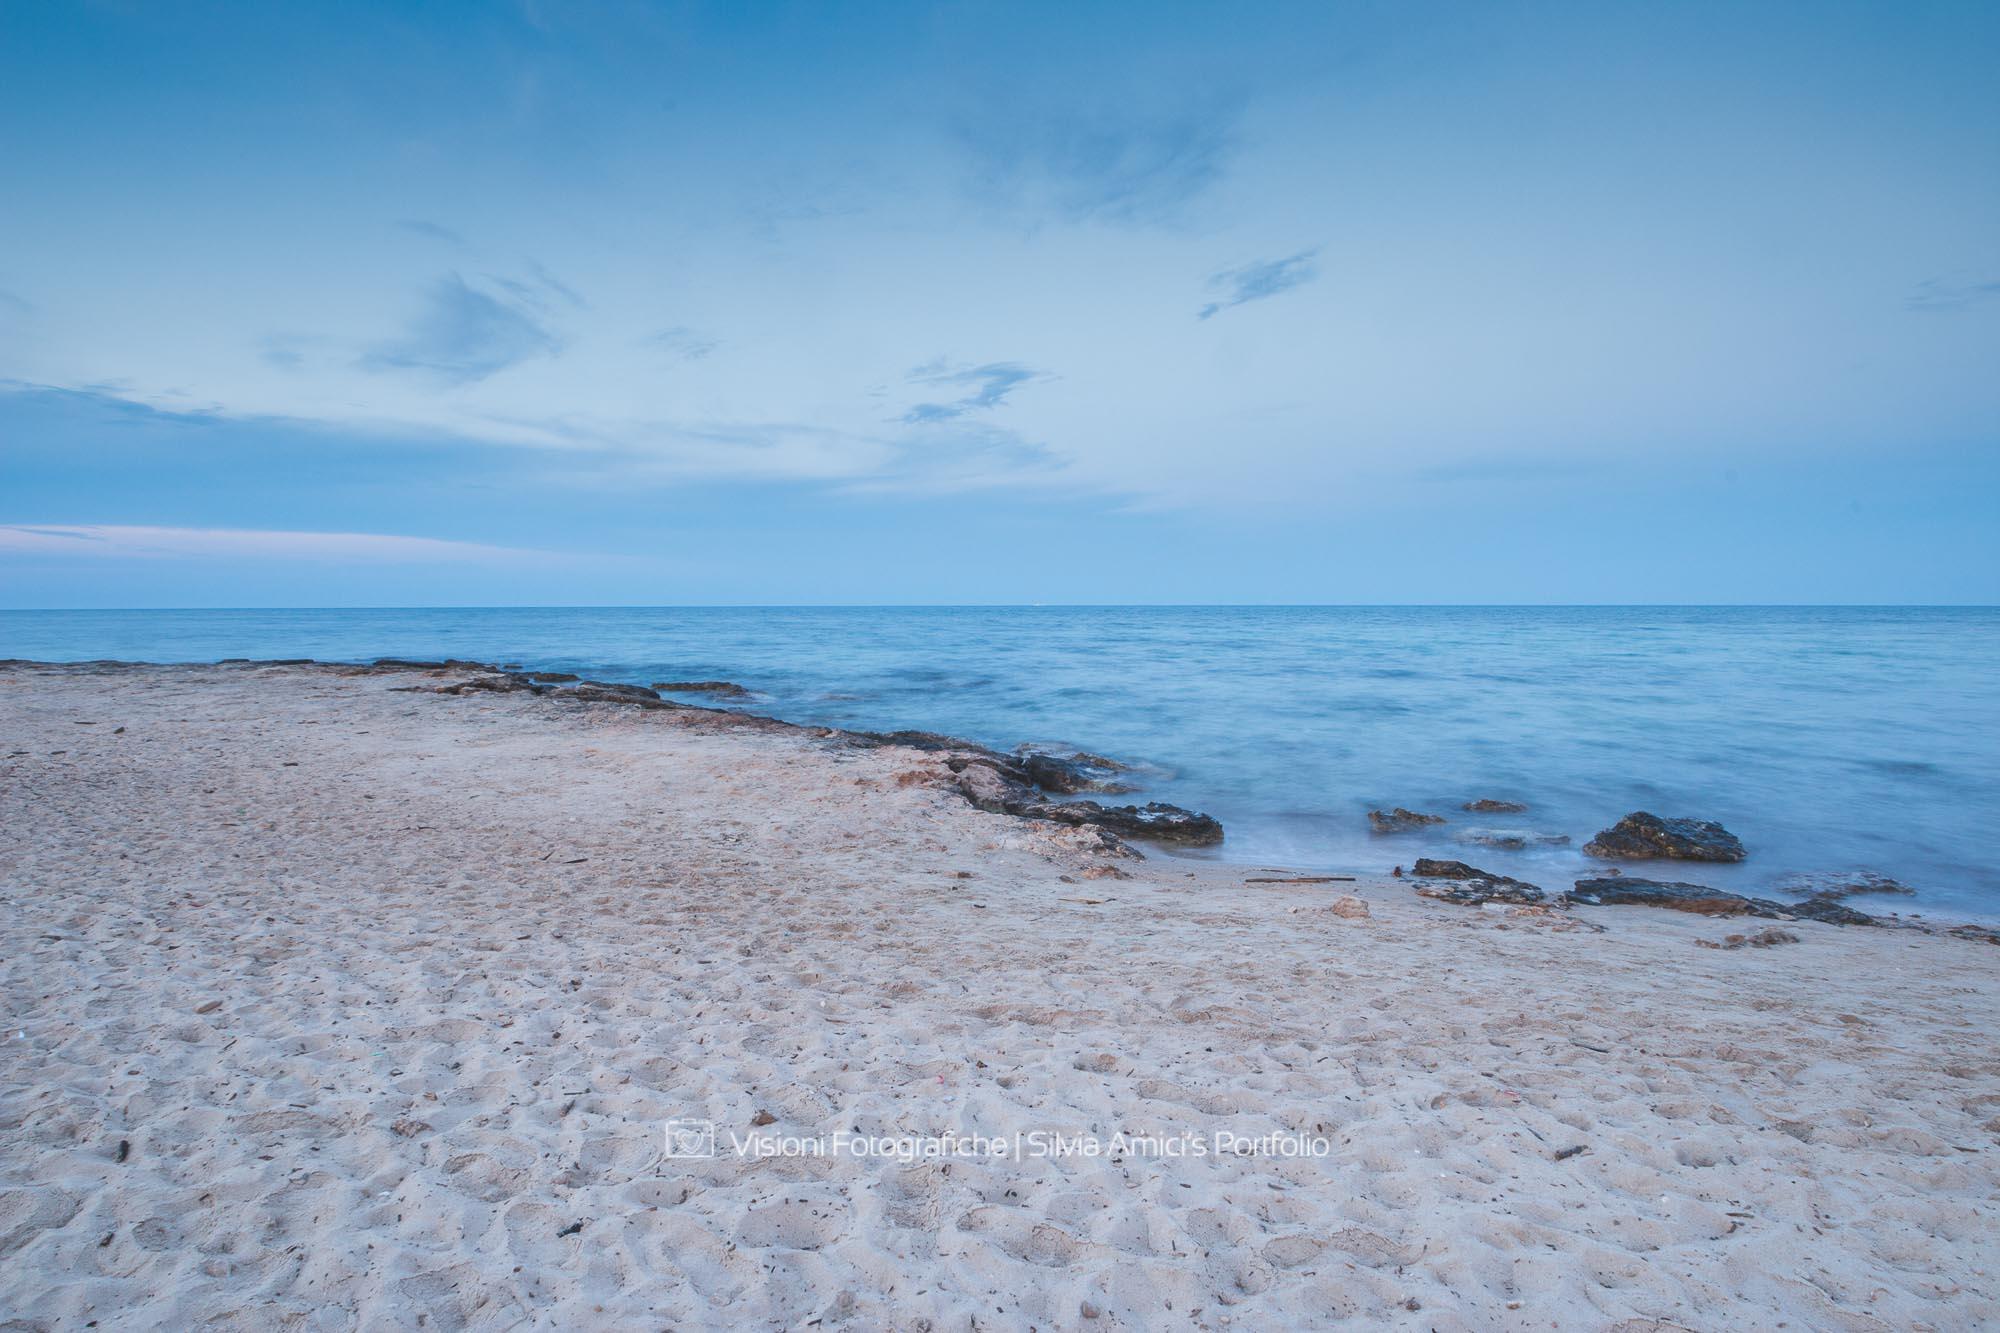 Spiagge Salento: Casalabate Lecce